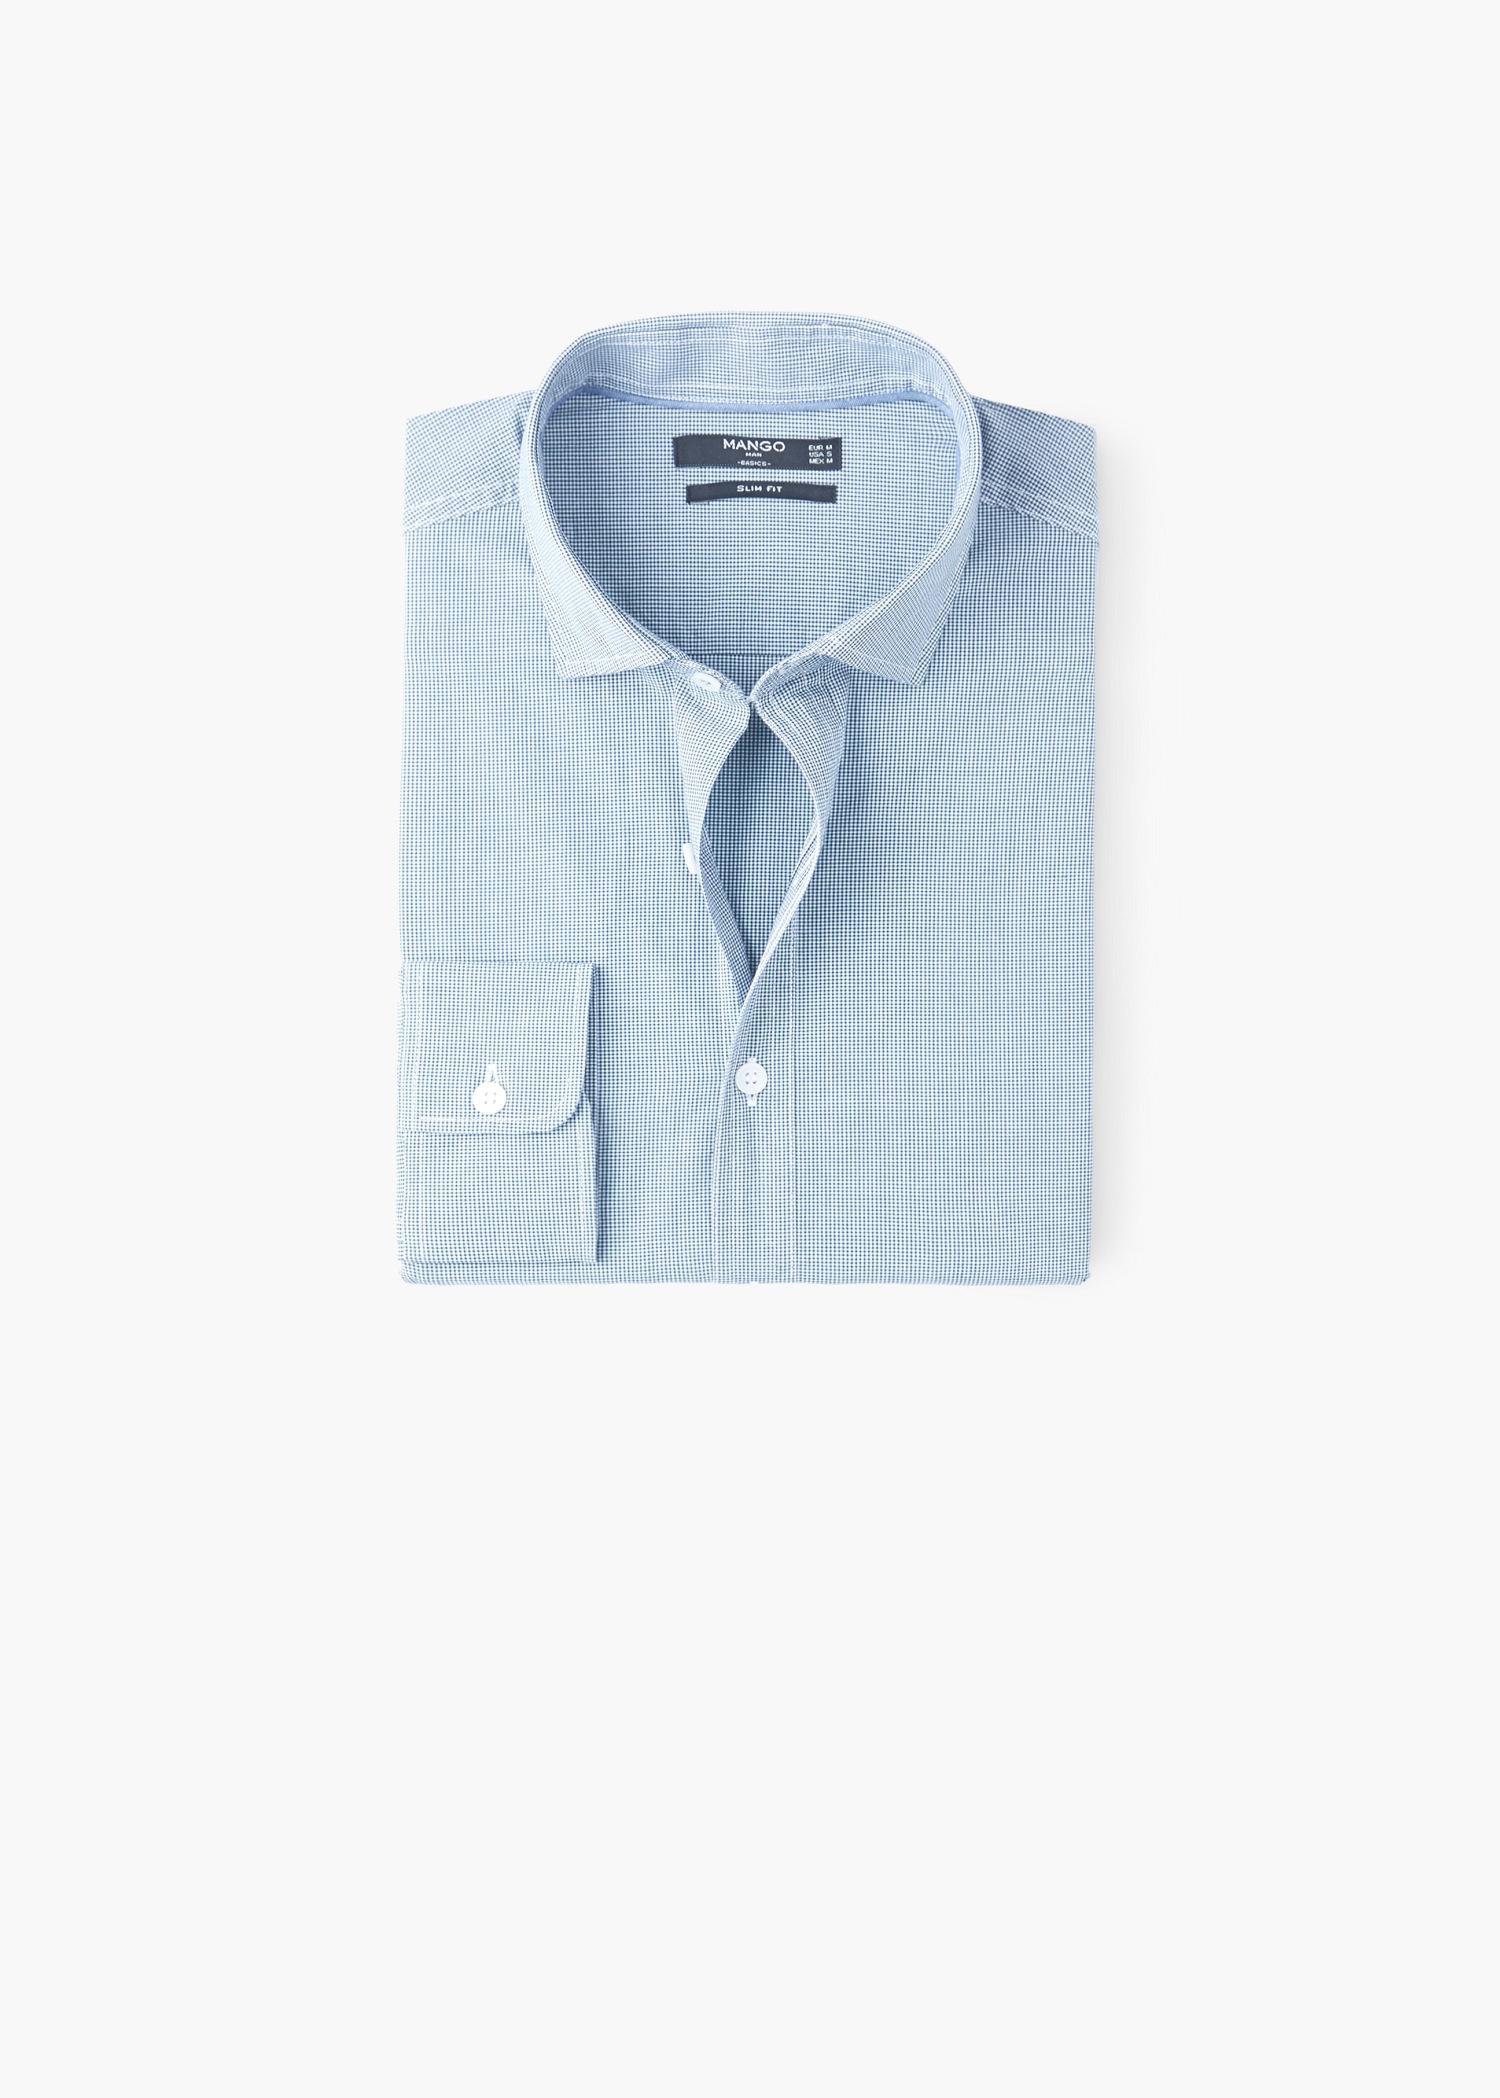 Mango Slim Fit Gingham Check Shirt In Green For Men Lyst